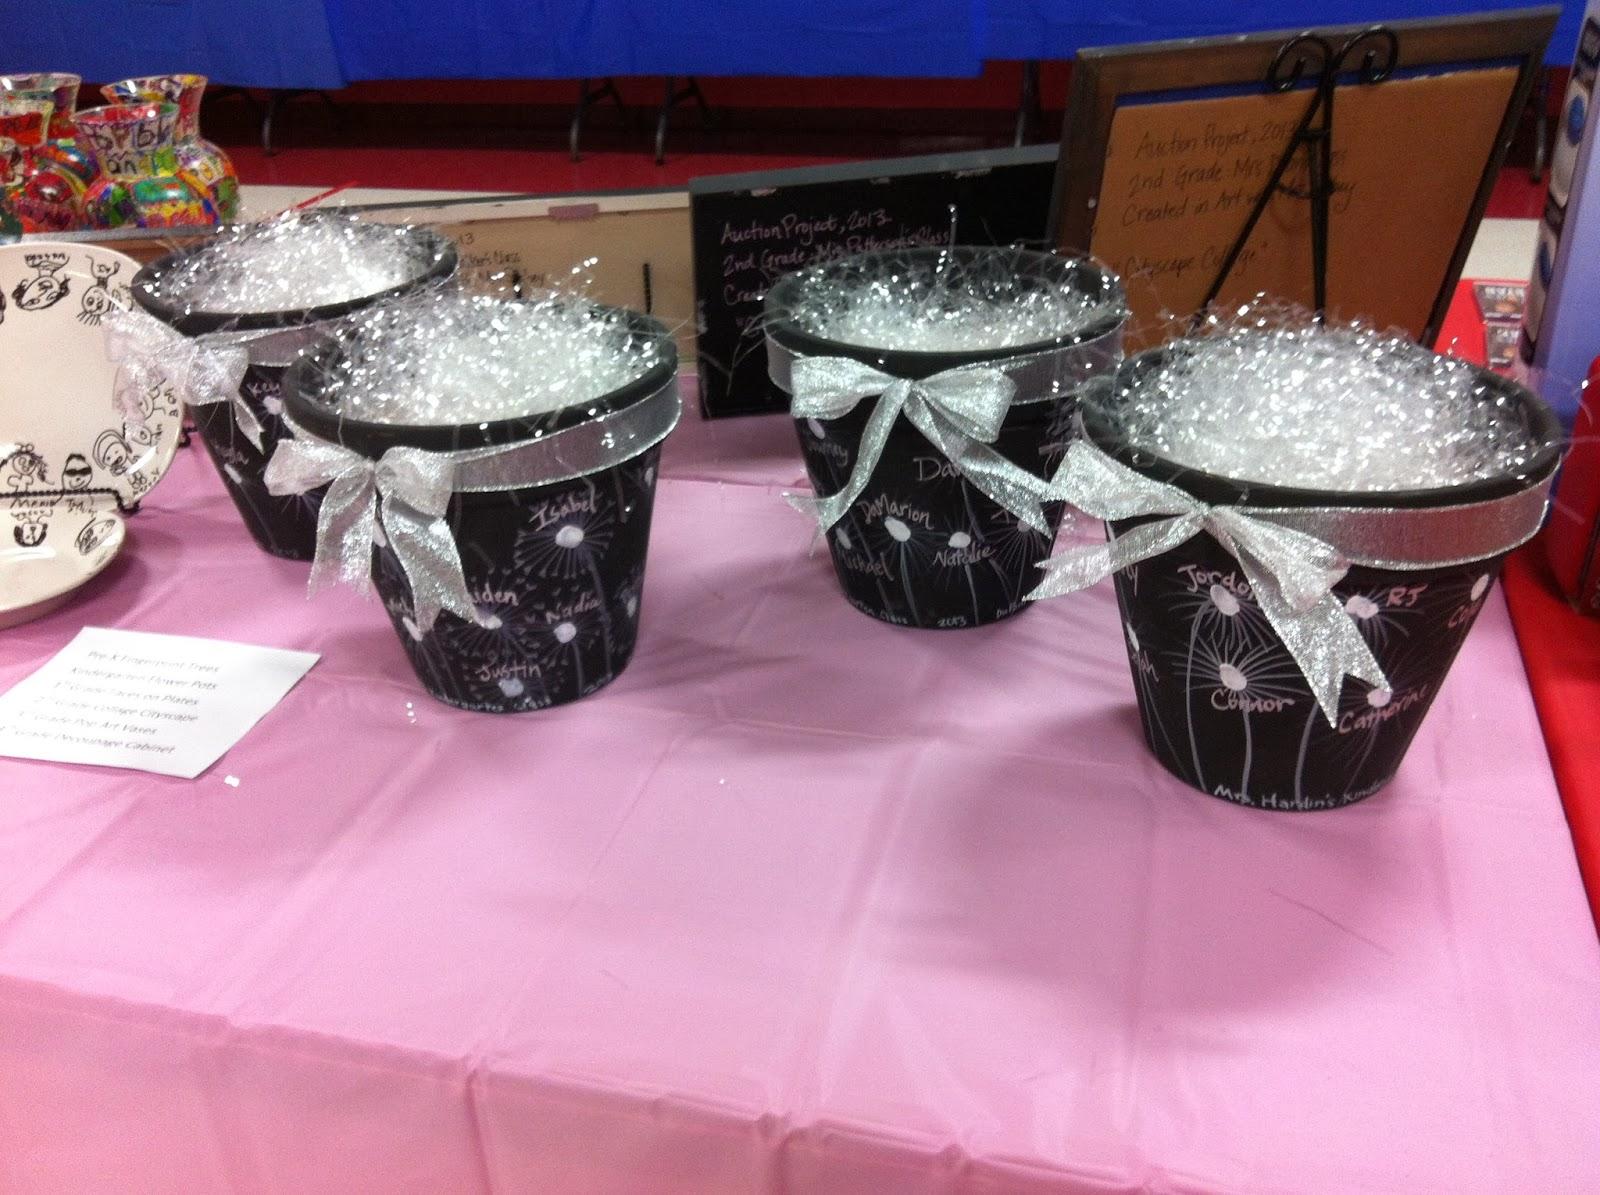 Chumleyscobey Art Room Kindergarten Flower Pots Auction